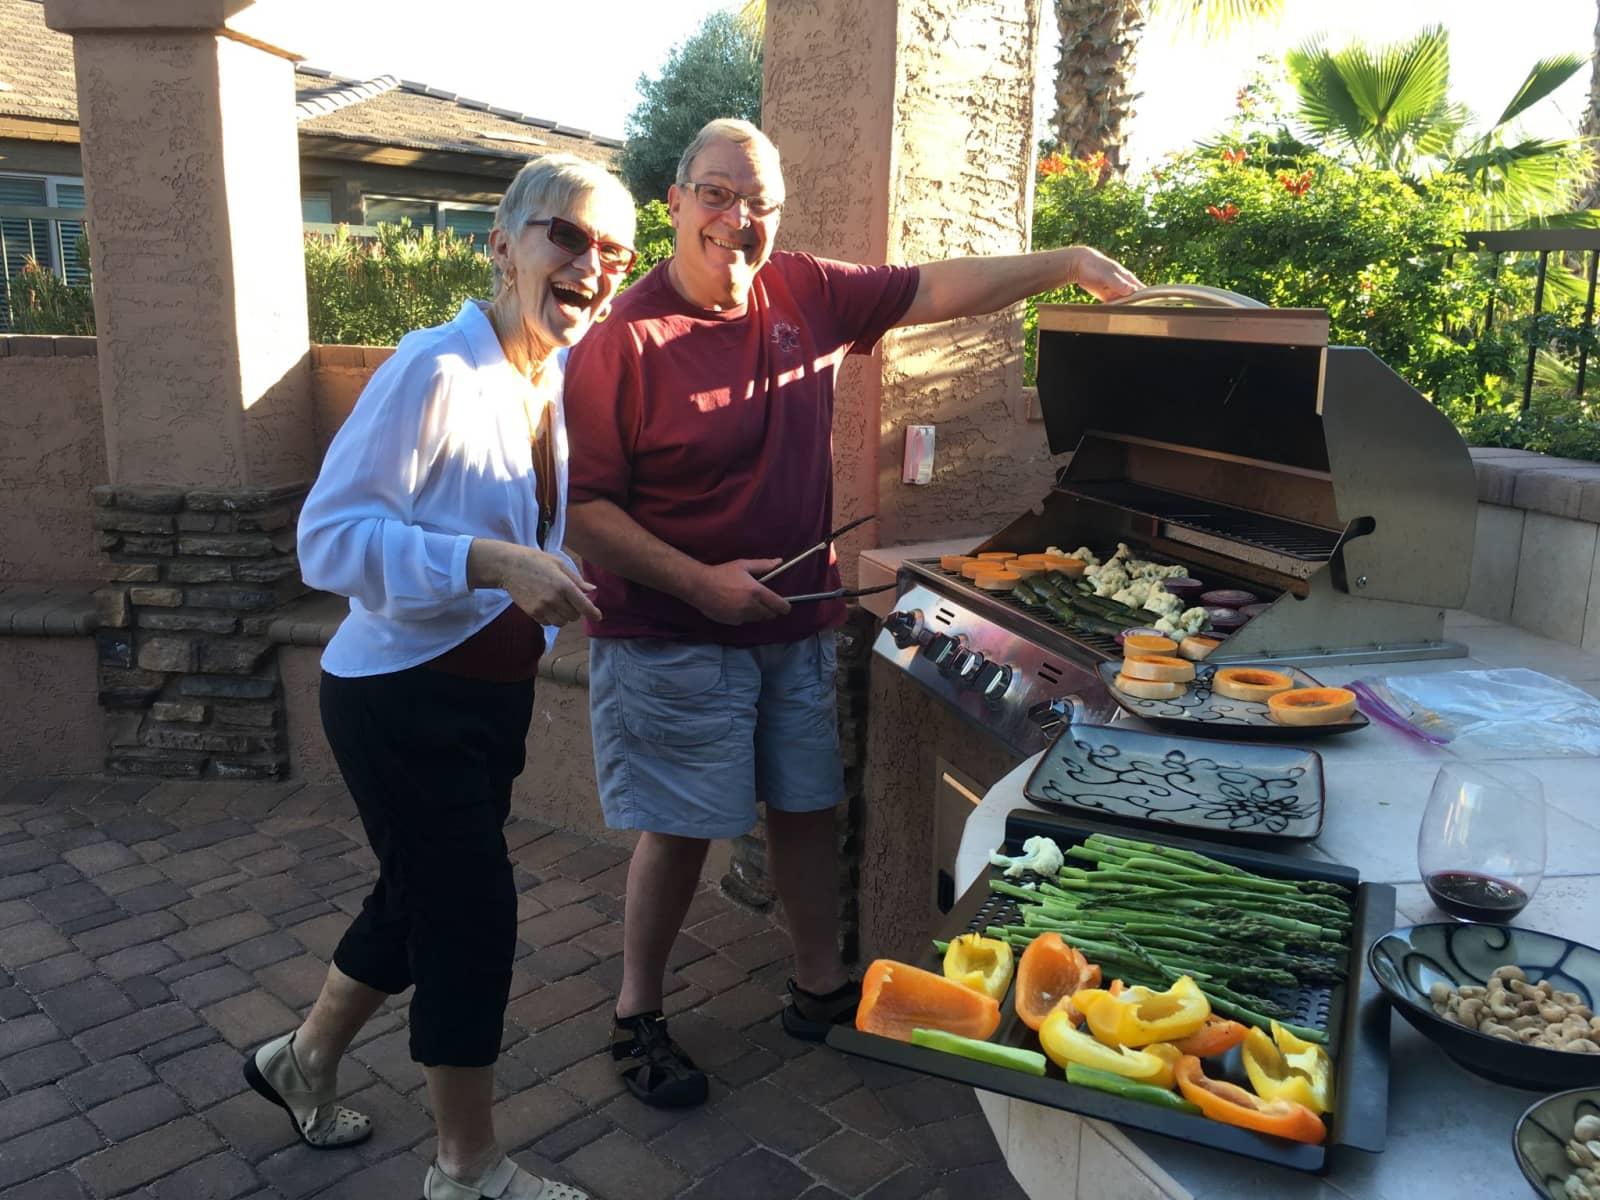 David & Pam from Spokane Valley, Washington, United States